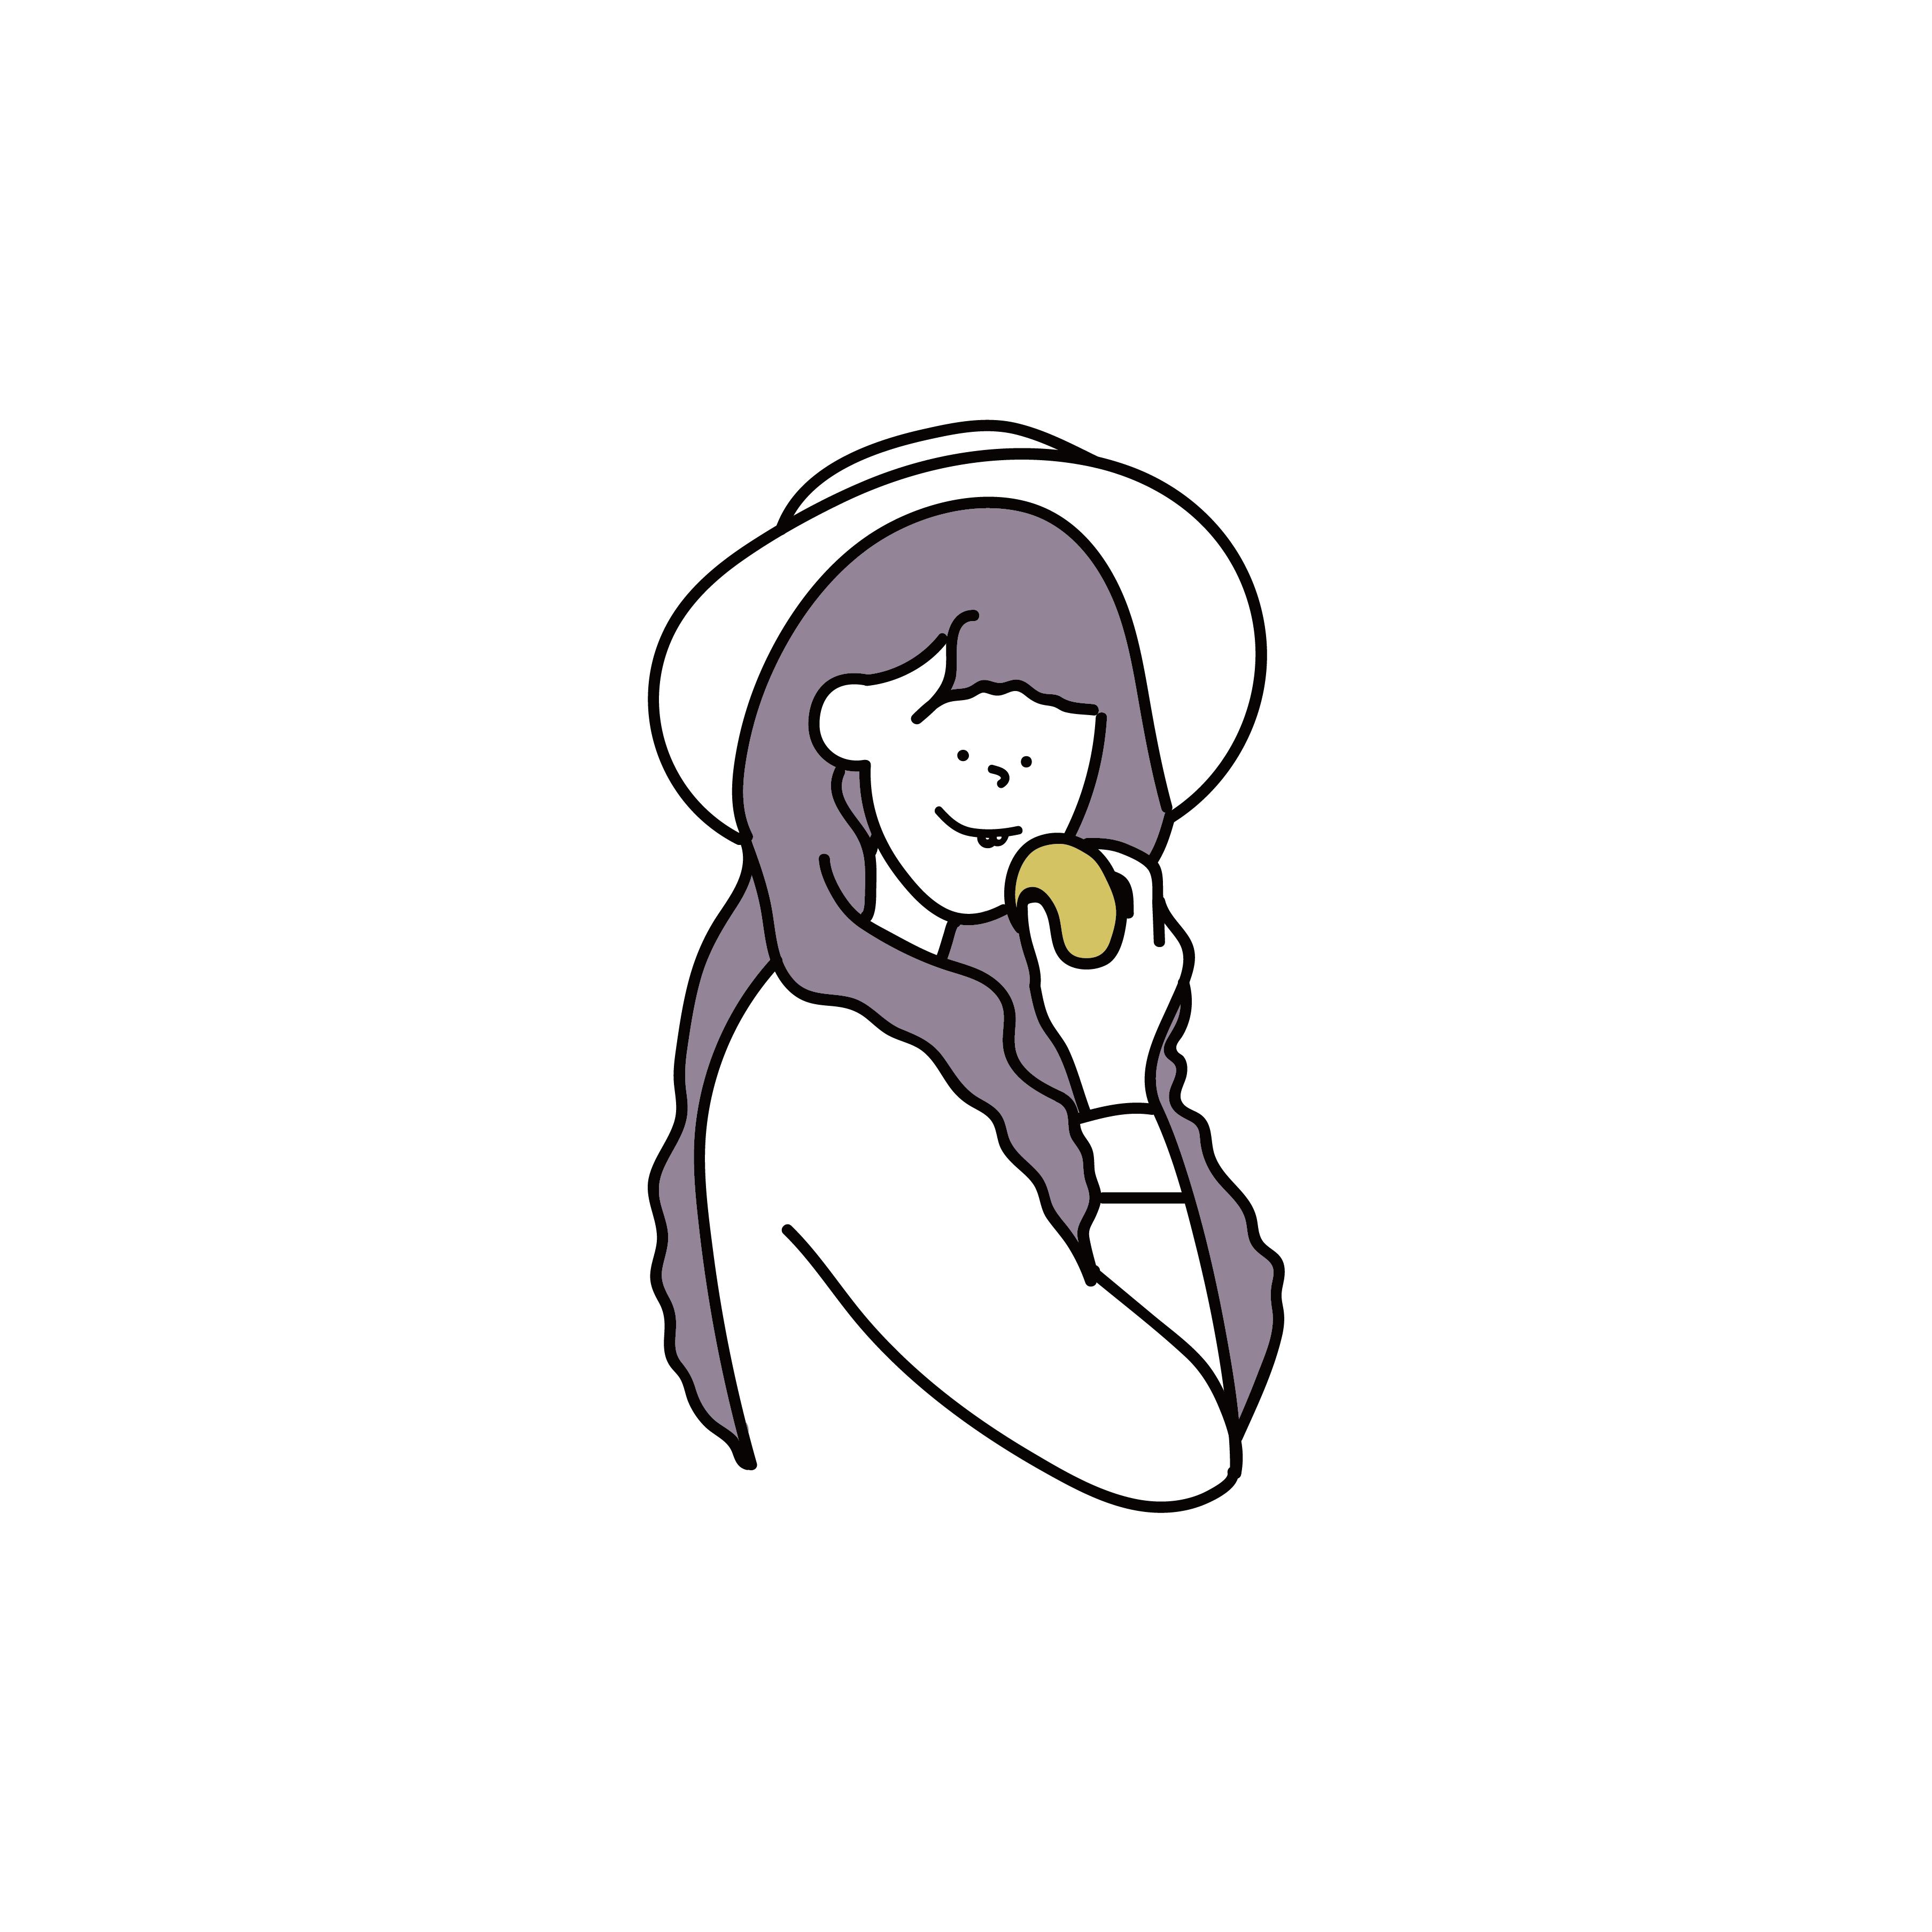 Pachimaru Illustration Illustrator Illust イラスト